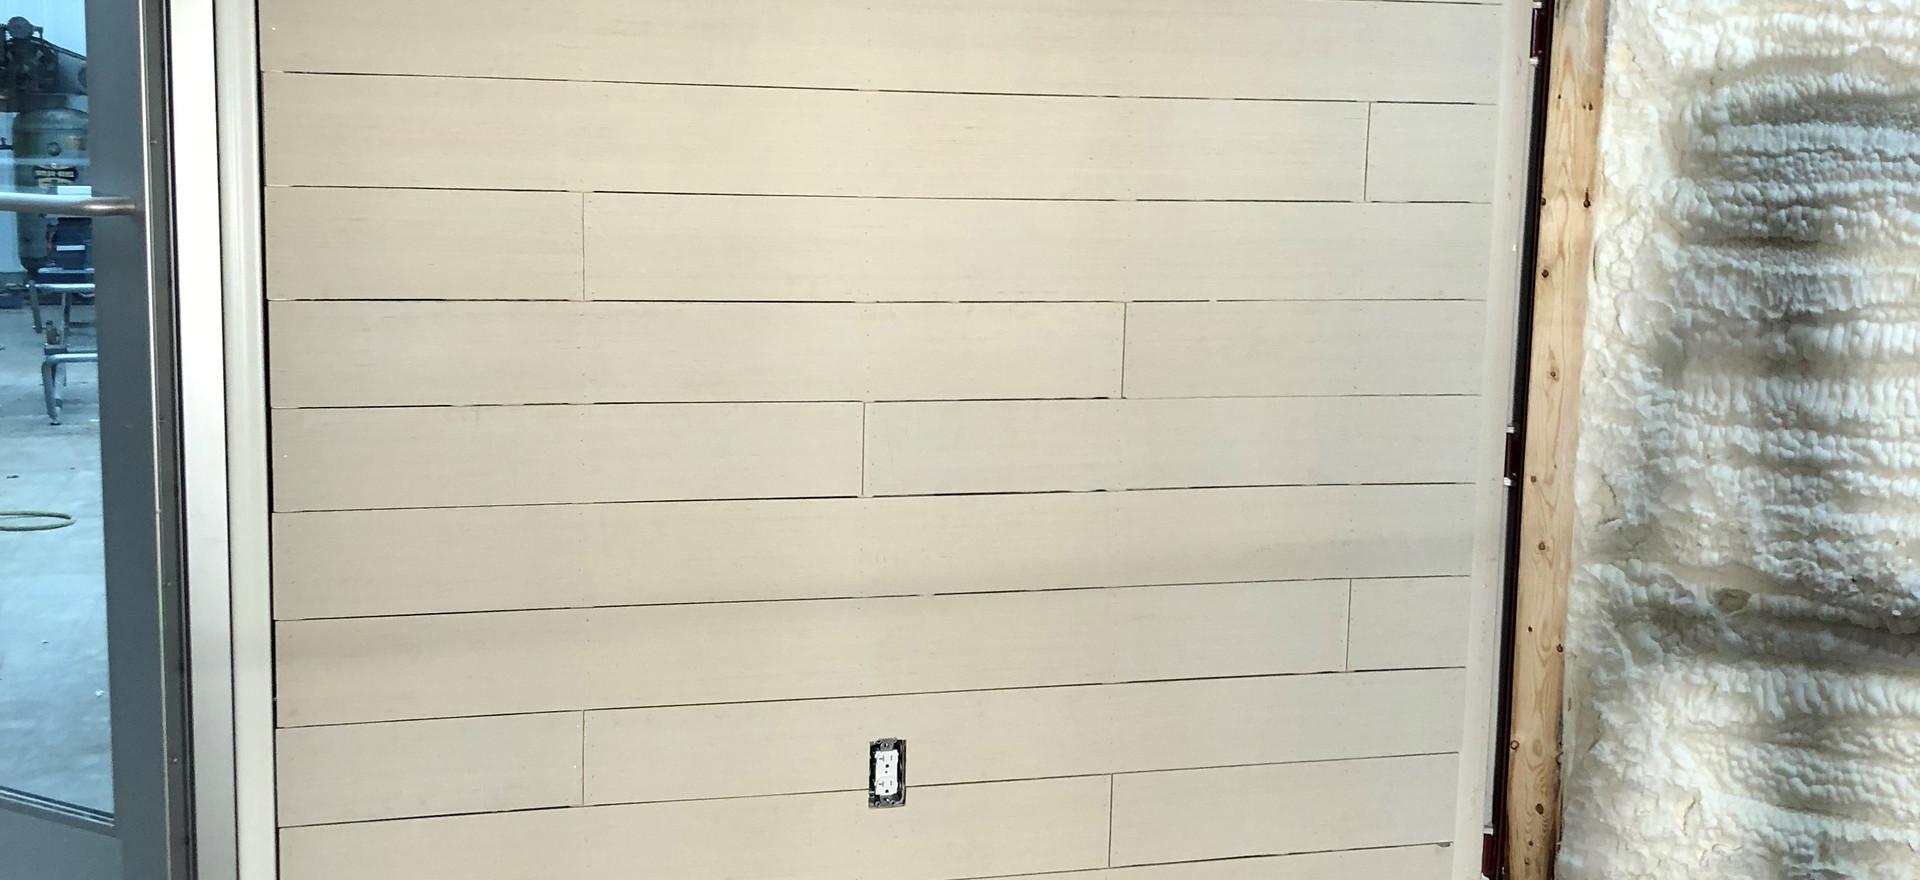 wallcovering2.jpg